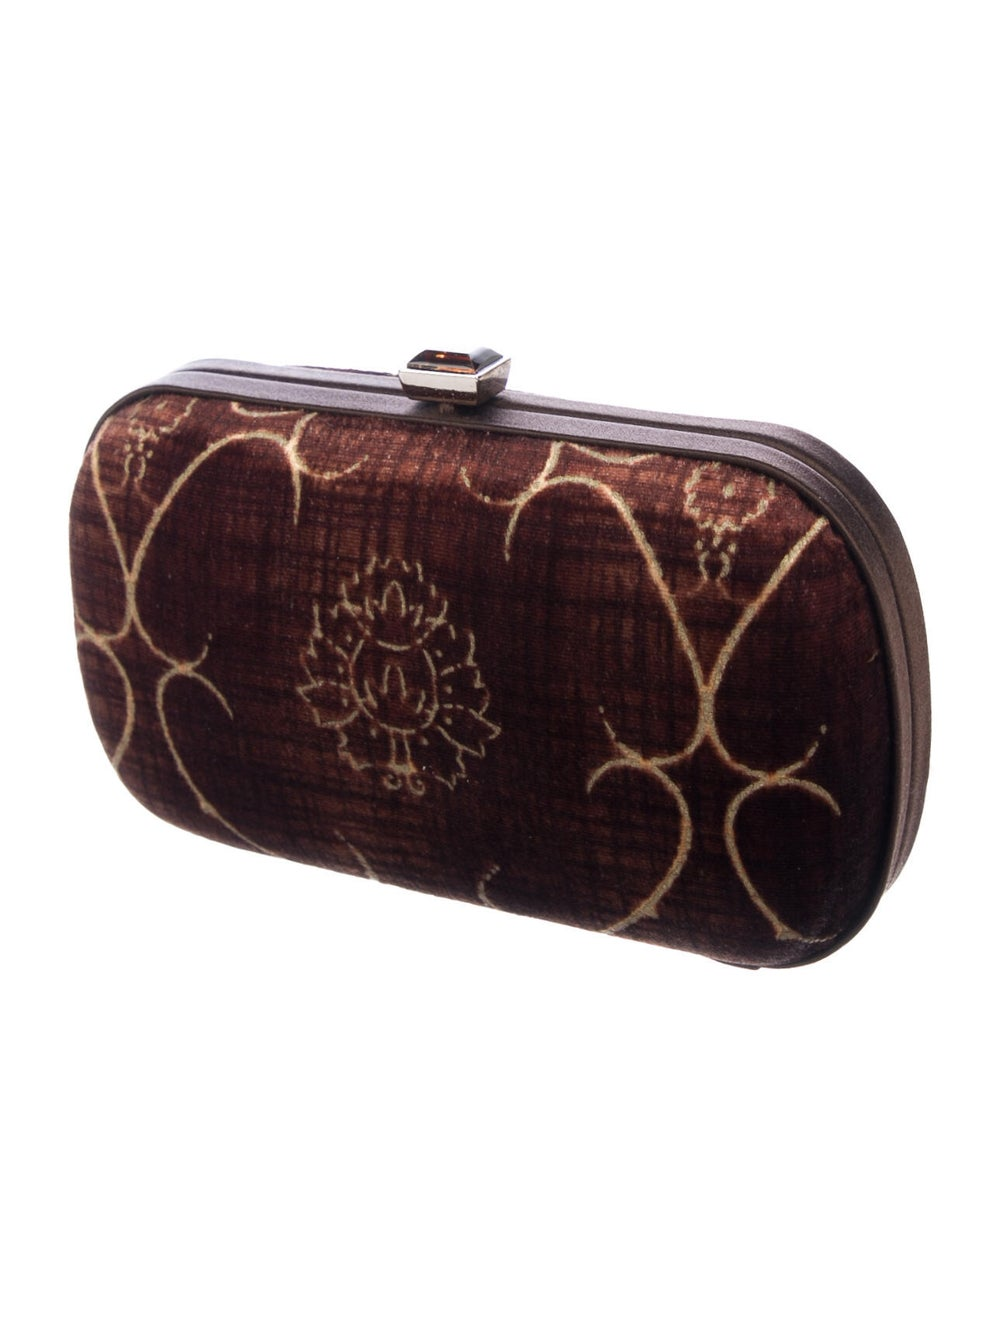 Bottega Veneta Vintage Velvet Box Clutch Brown - image 3